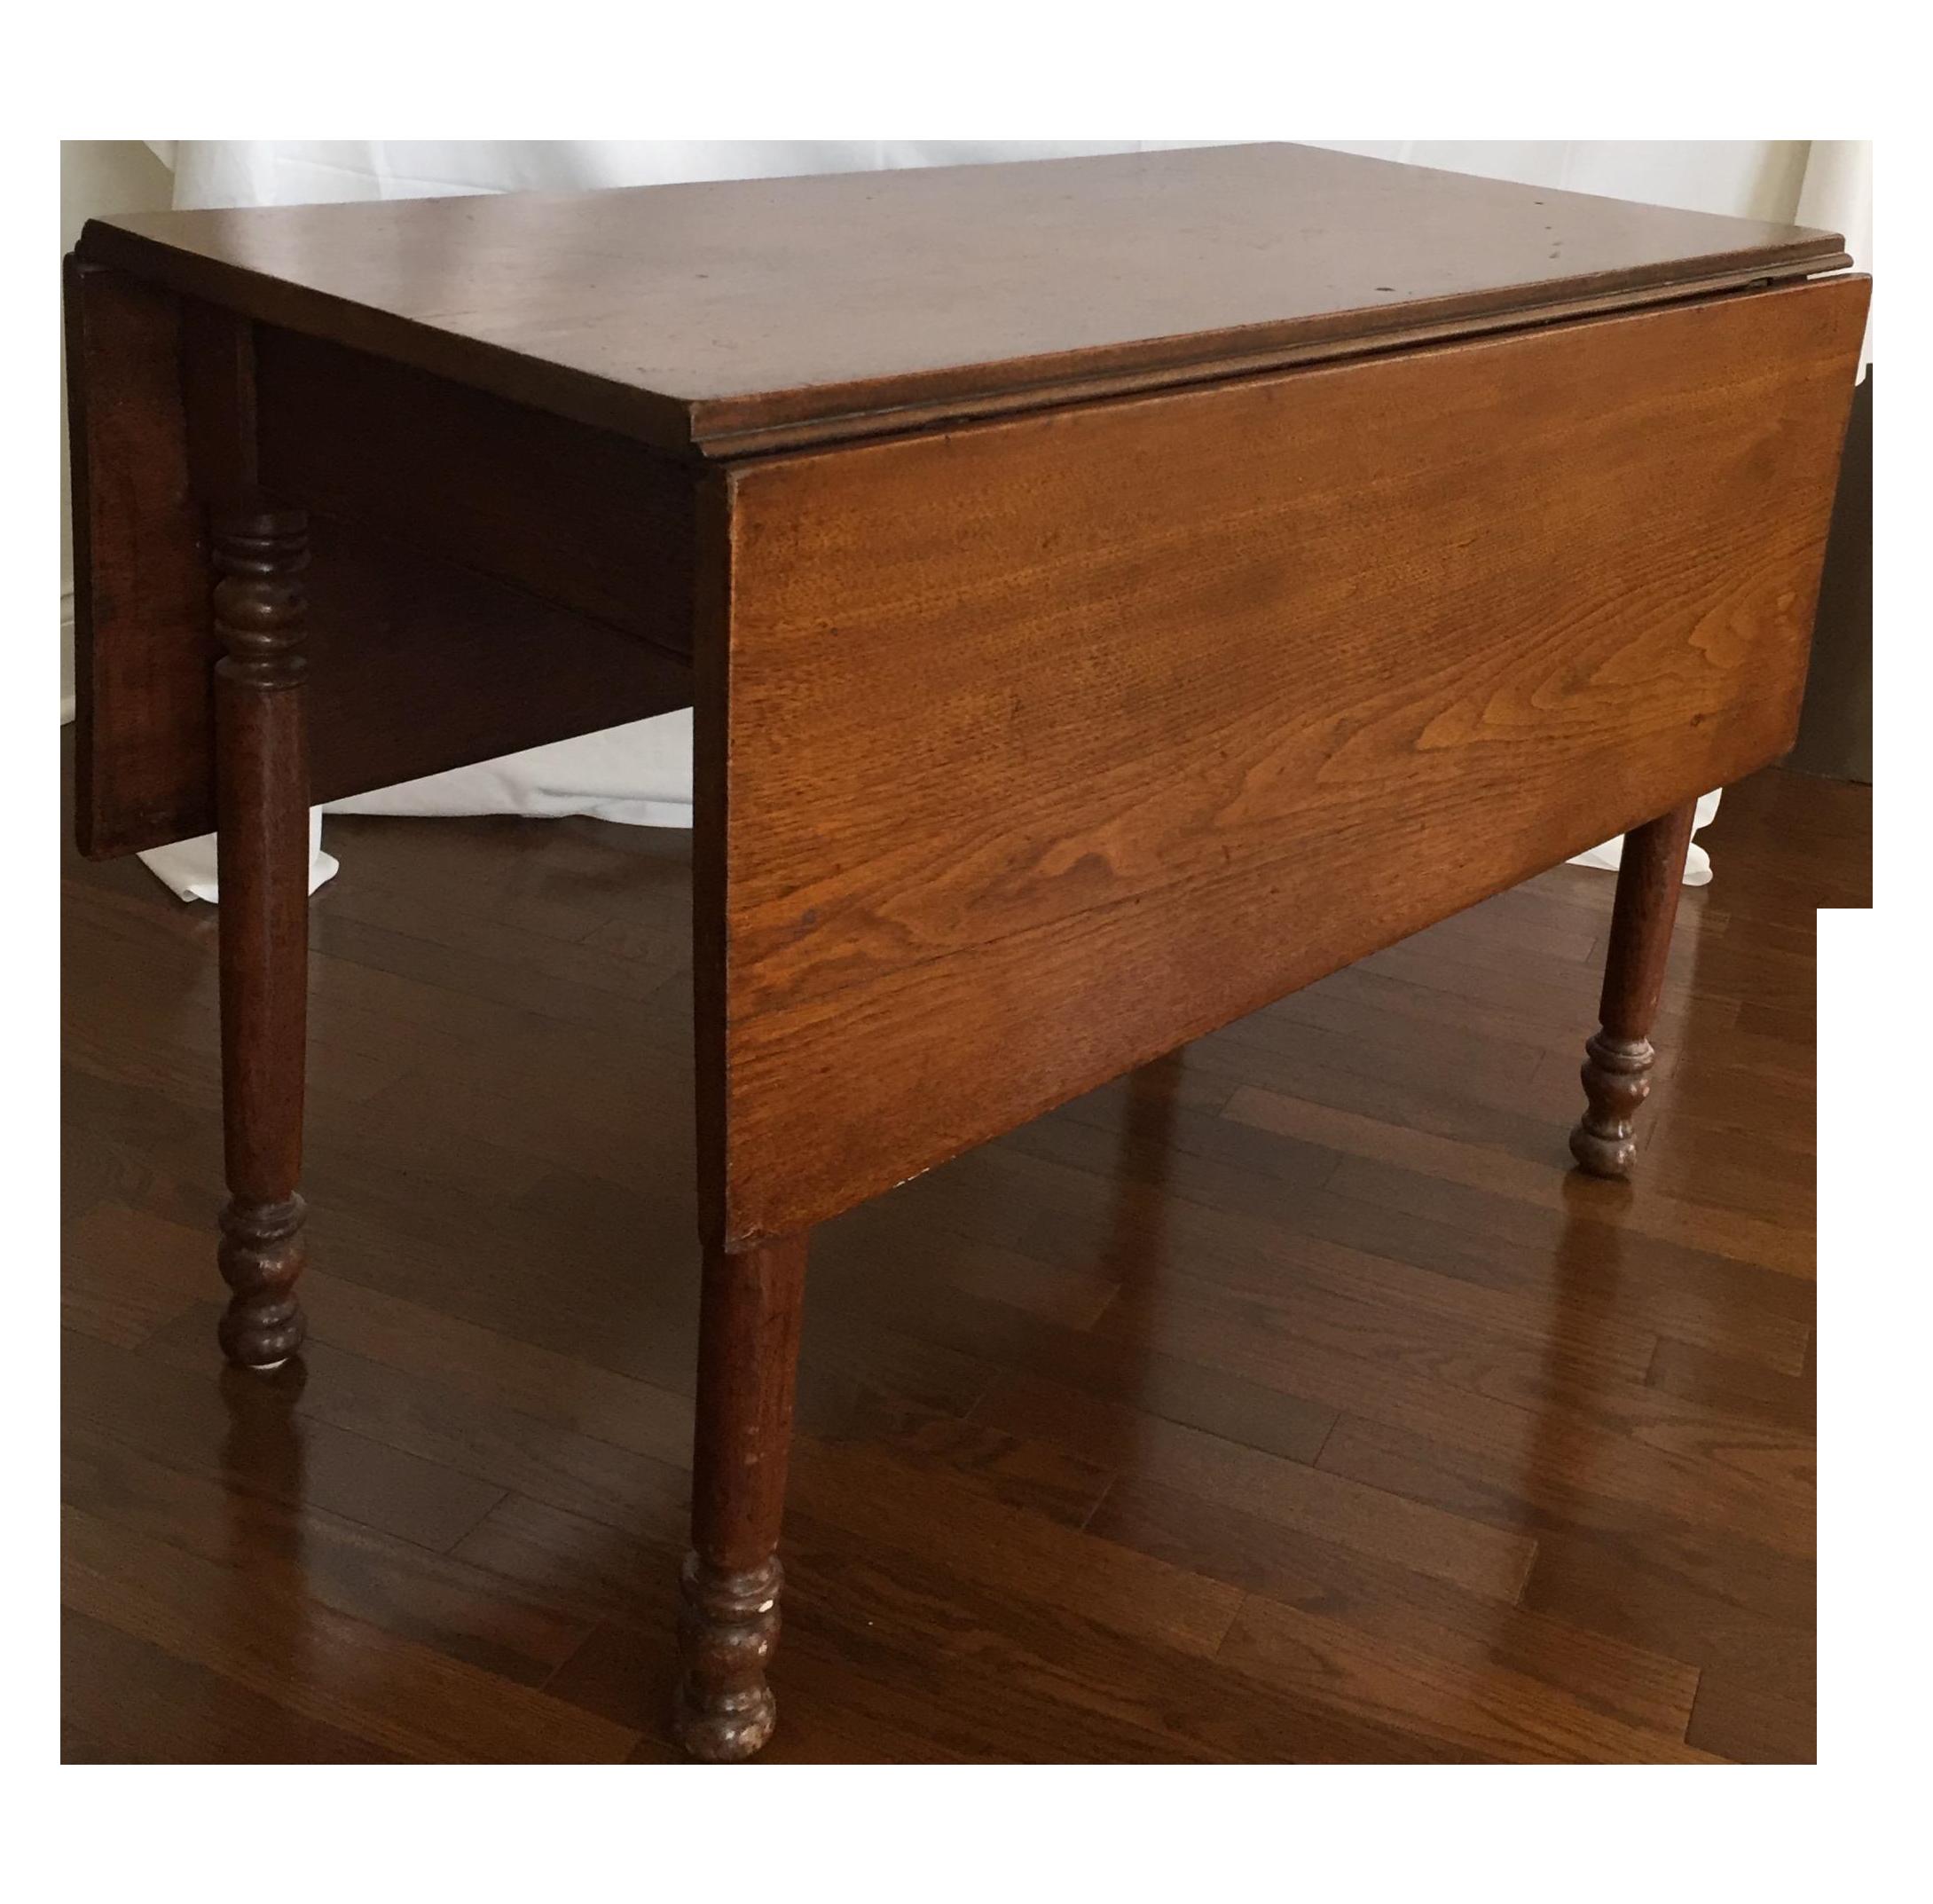 Antique Black Walnut Drop Leaf Dining Table